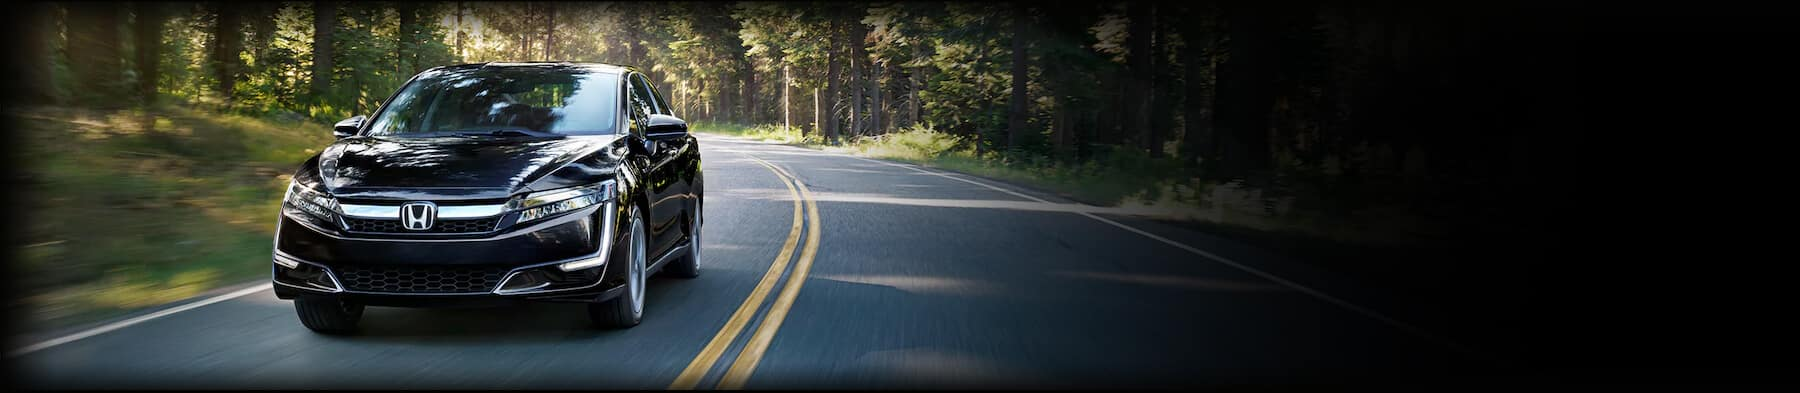 Honda Clarity Plug-in Hybrid Awards Hero Image